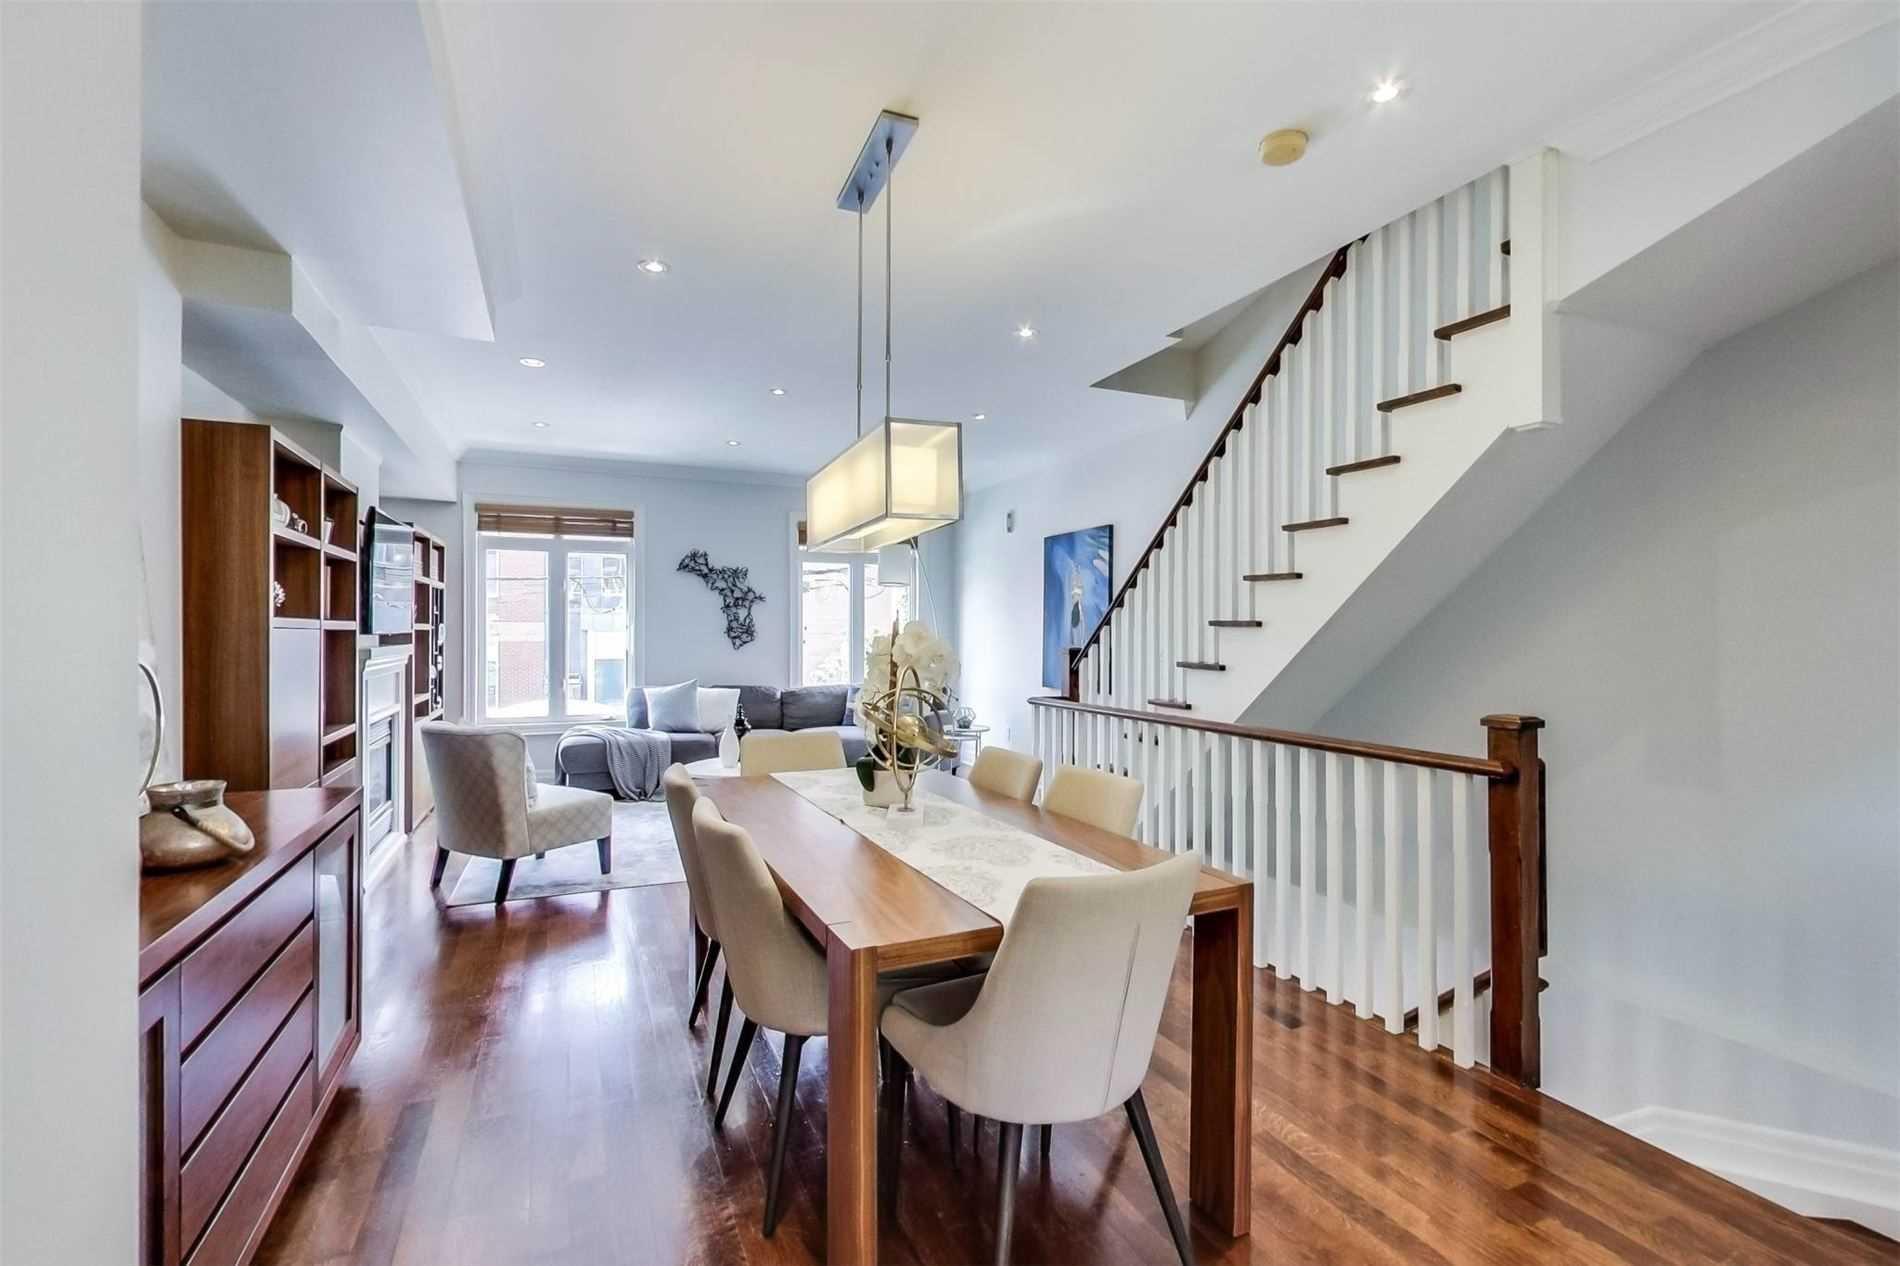 Photo 9: Photos: 213 Heward Avenue in Toronto: South Riverdale House (3-Storey) for sale (Toronto E01)  : MLS®# E4941877